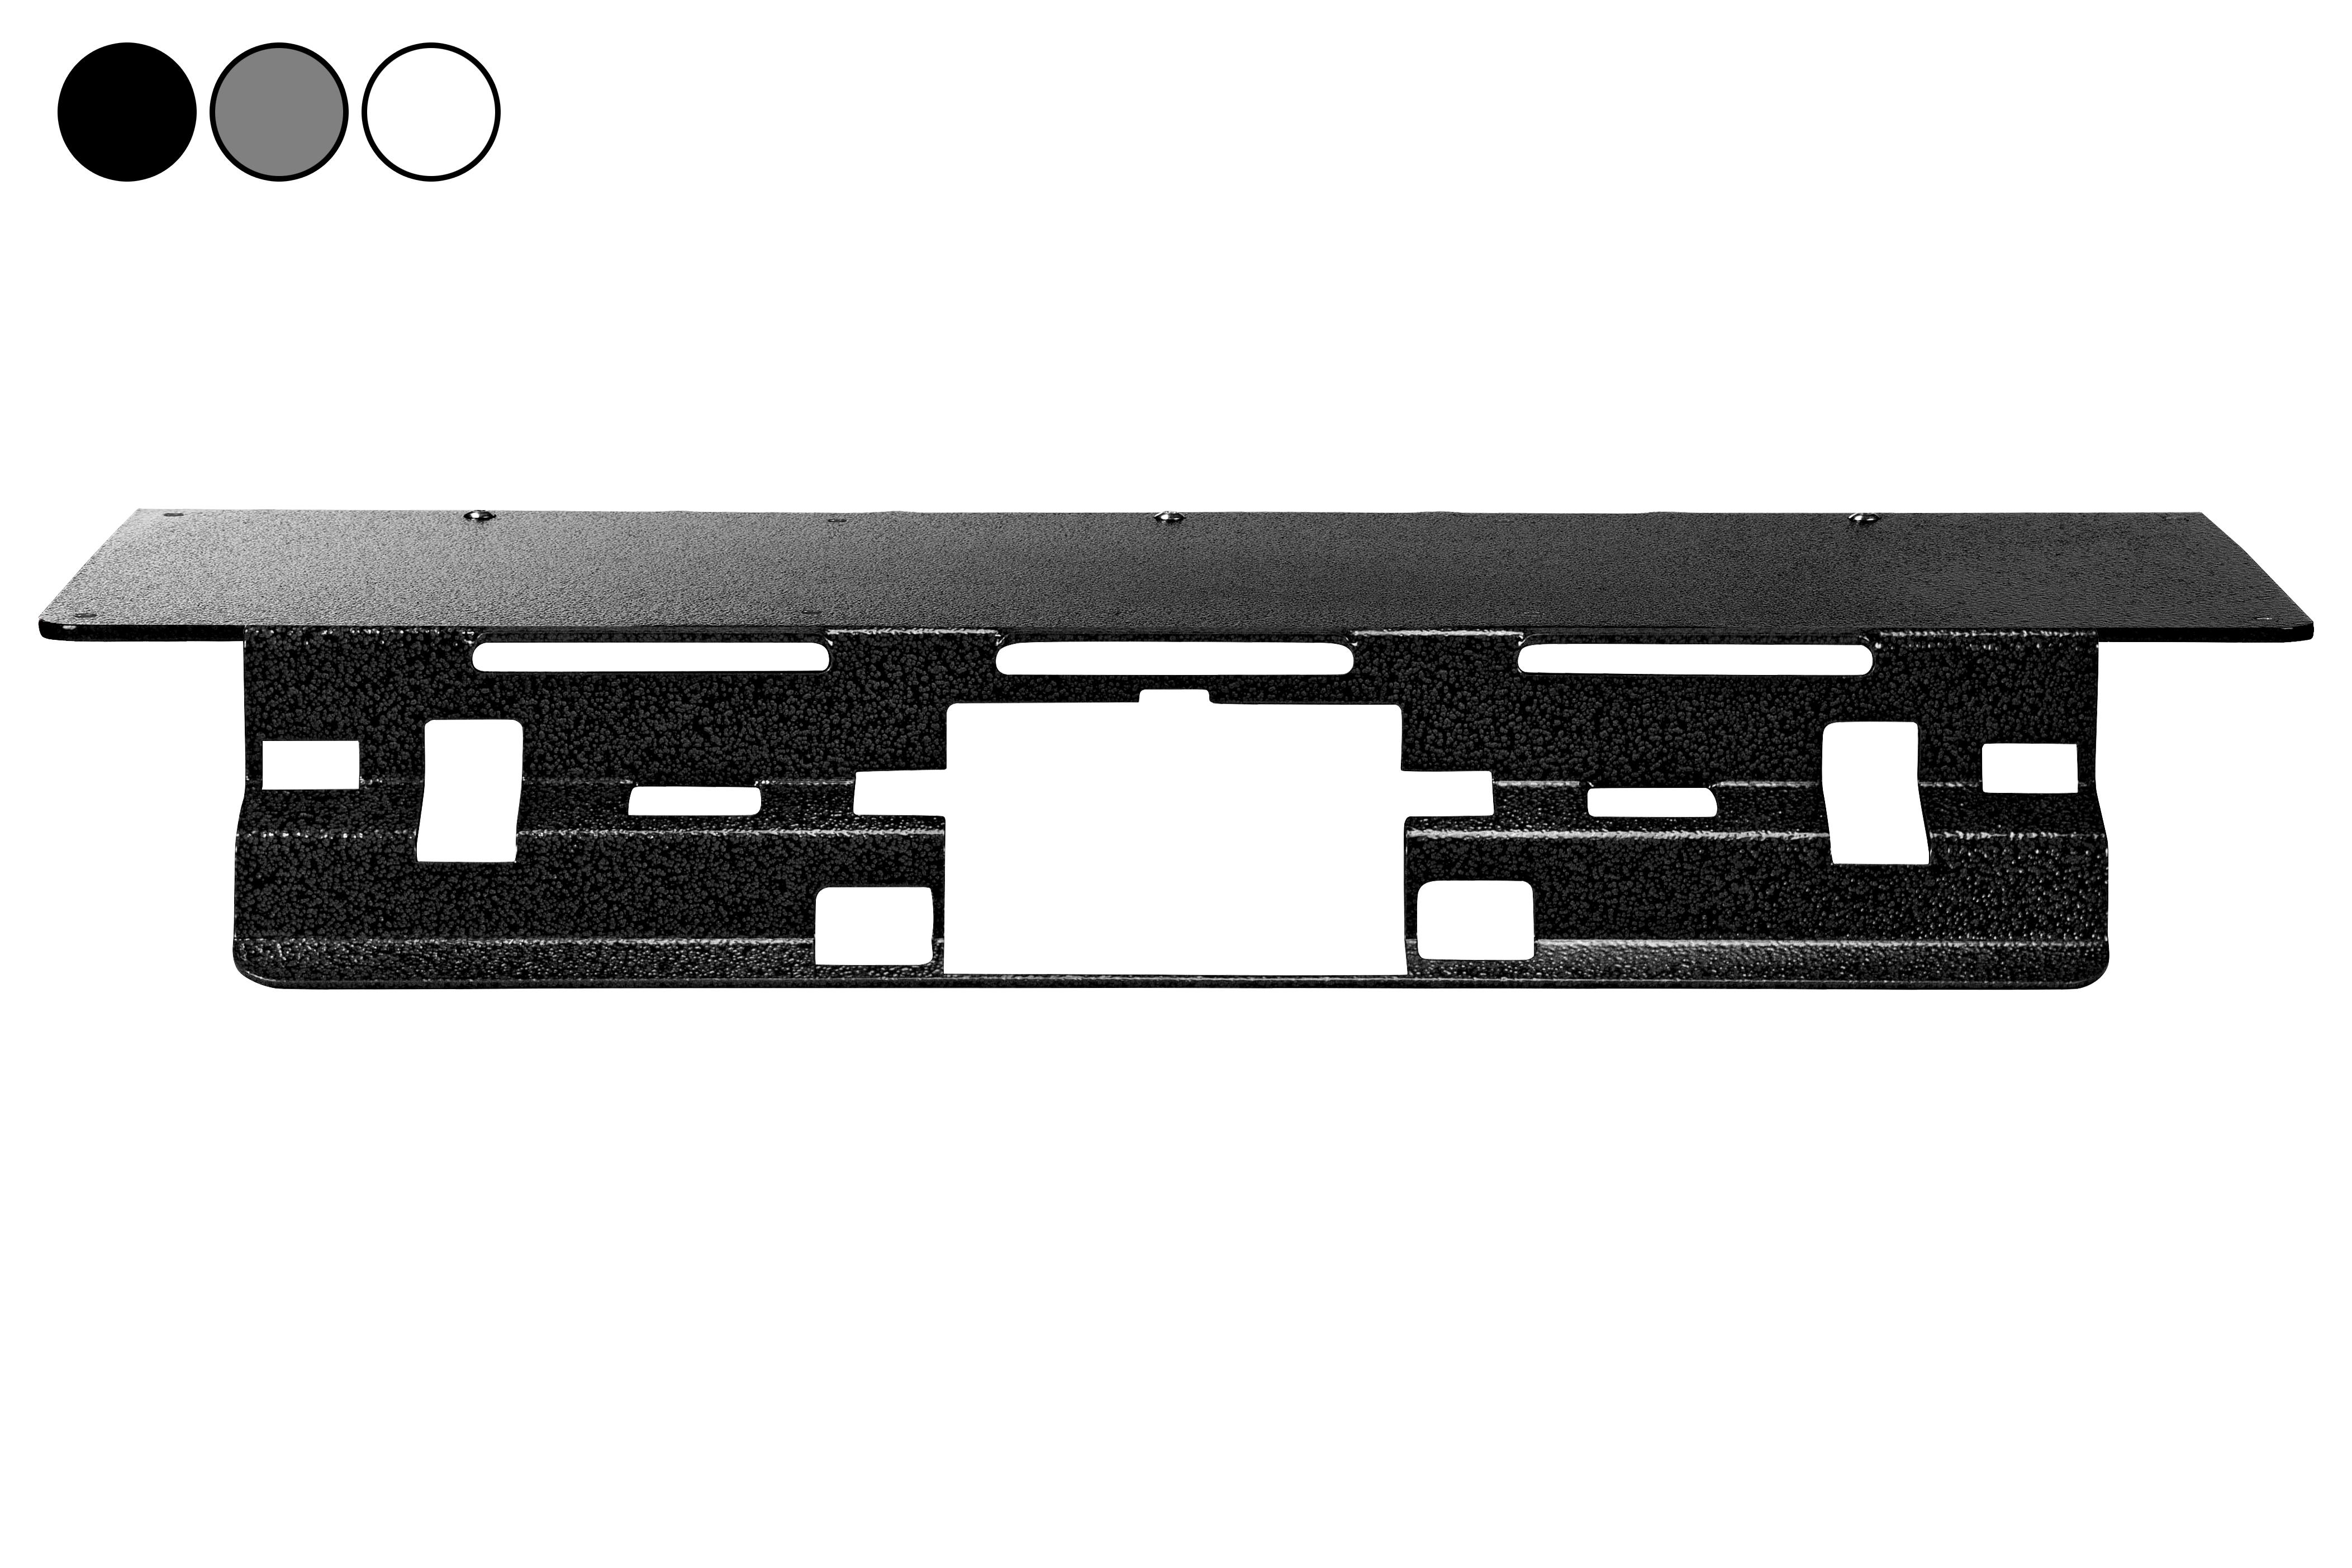 No Drill Mounting Plate, Fits 2020 Chevrolet Silverado 3500HD w/ Spoiler, Permanent